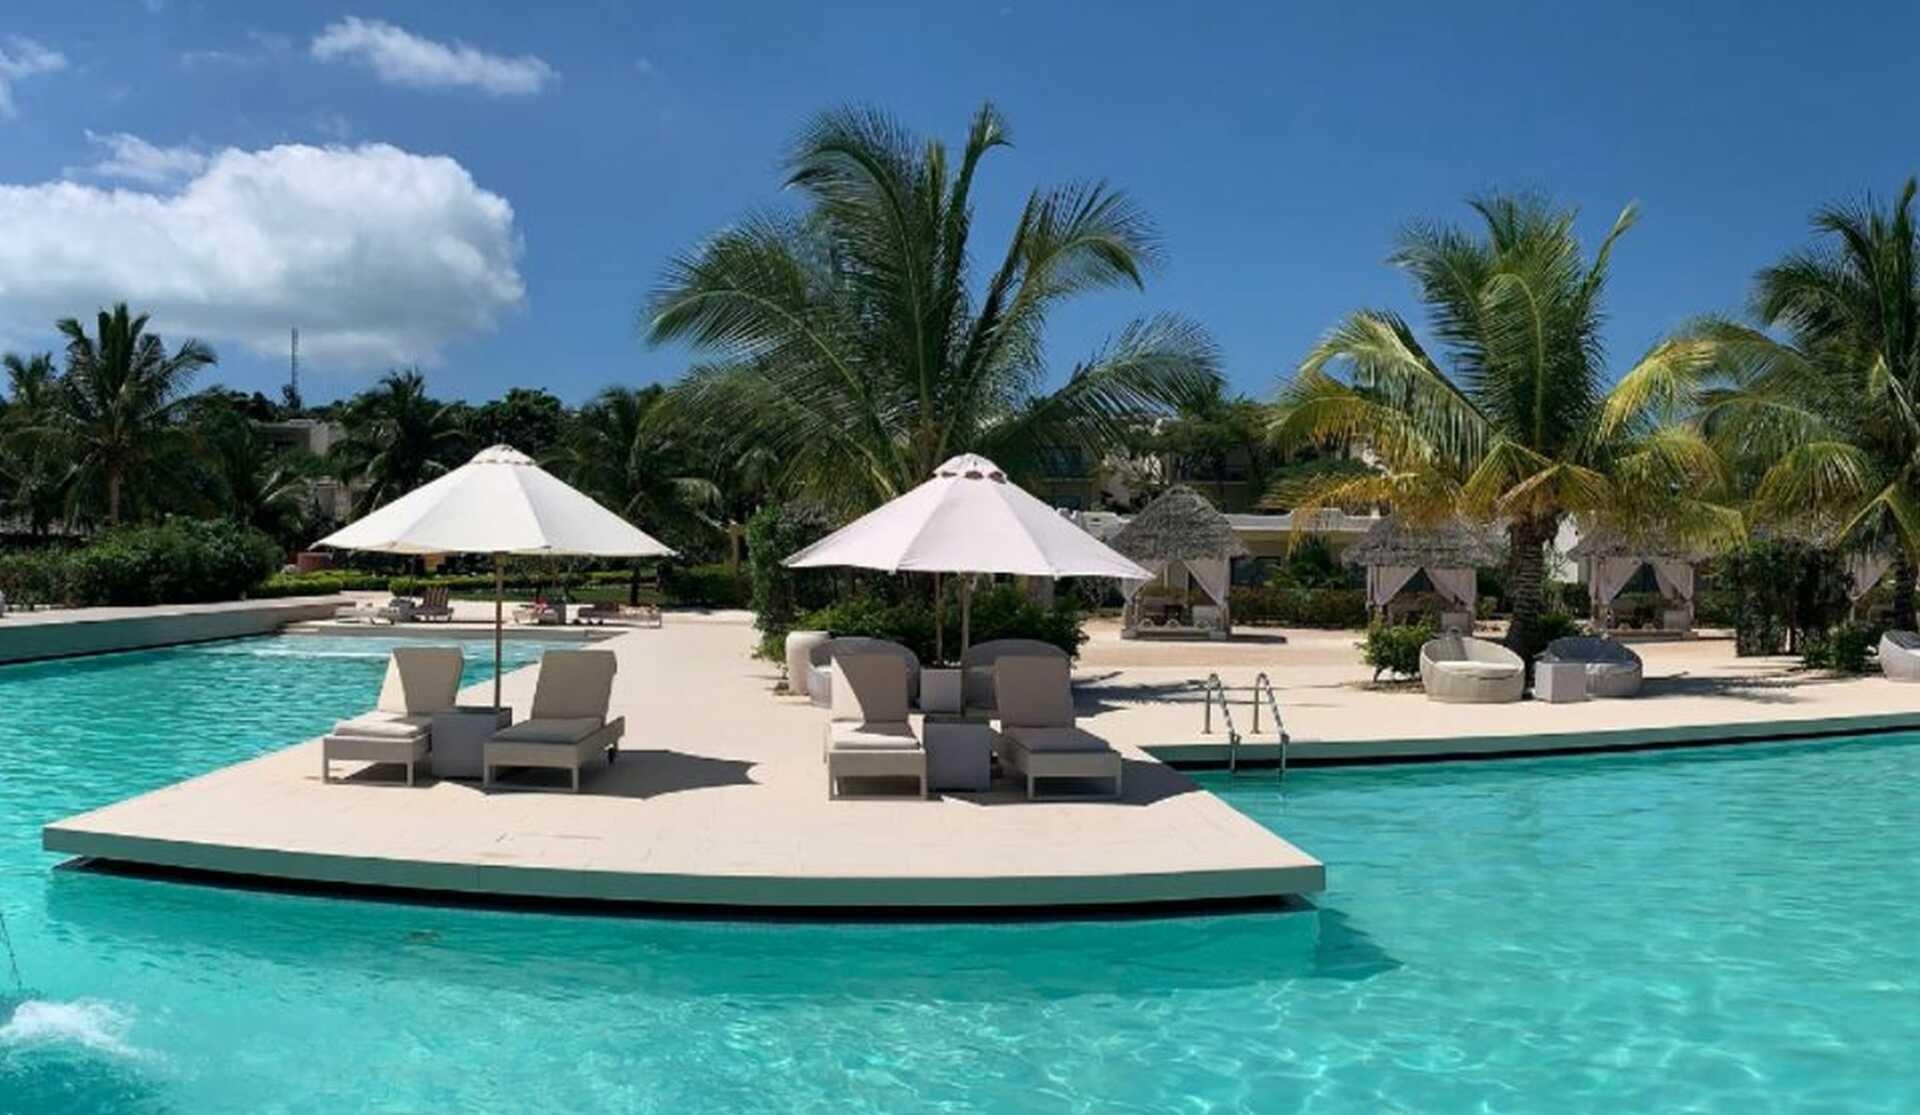 Gold Zanzibar Beach House & Spa 5*- paket aranžman